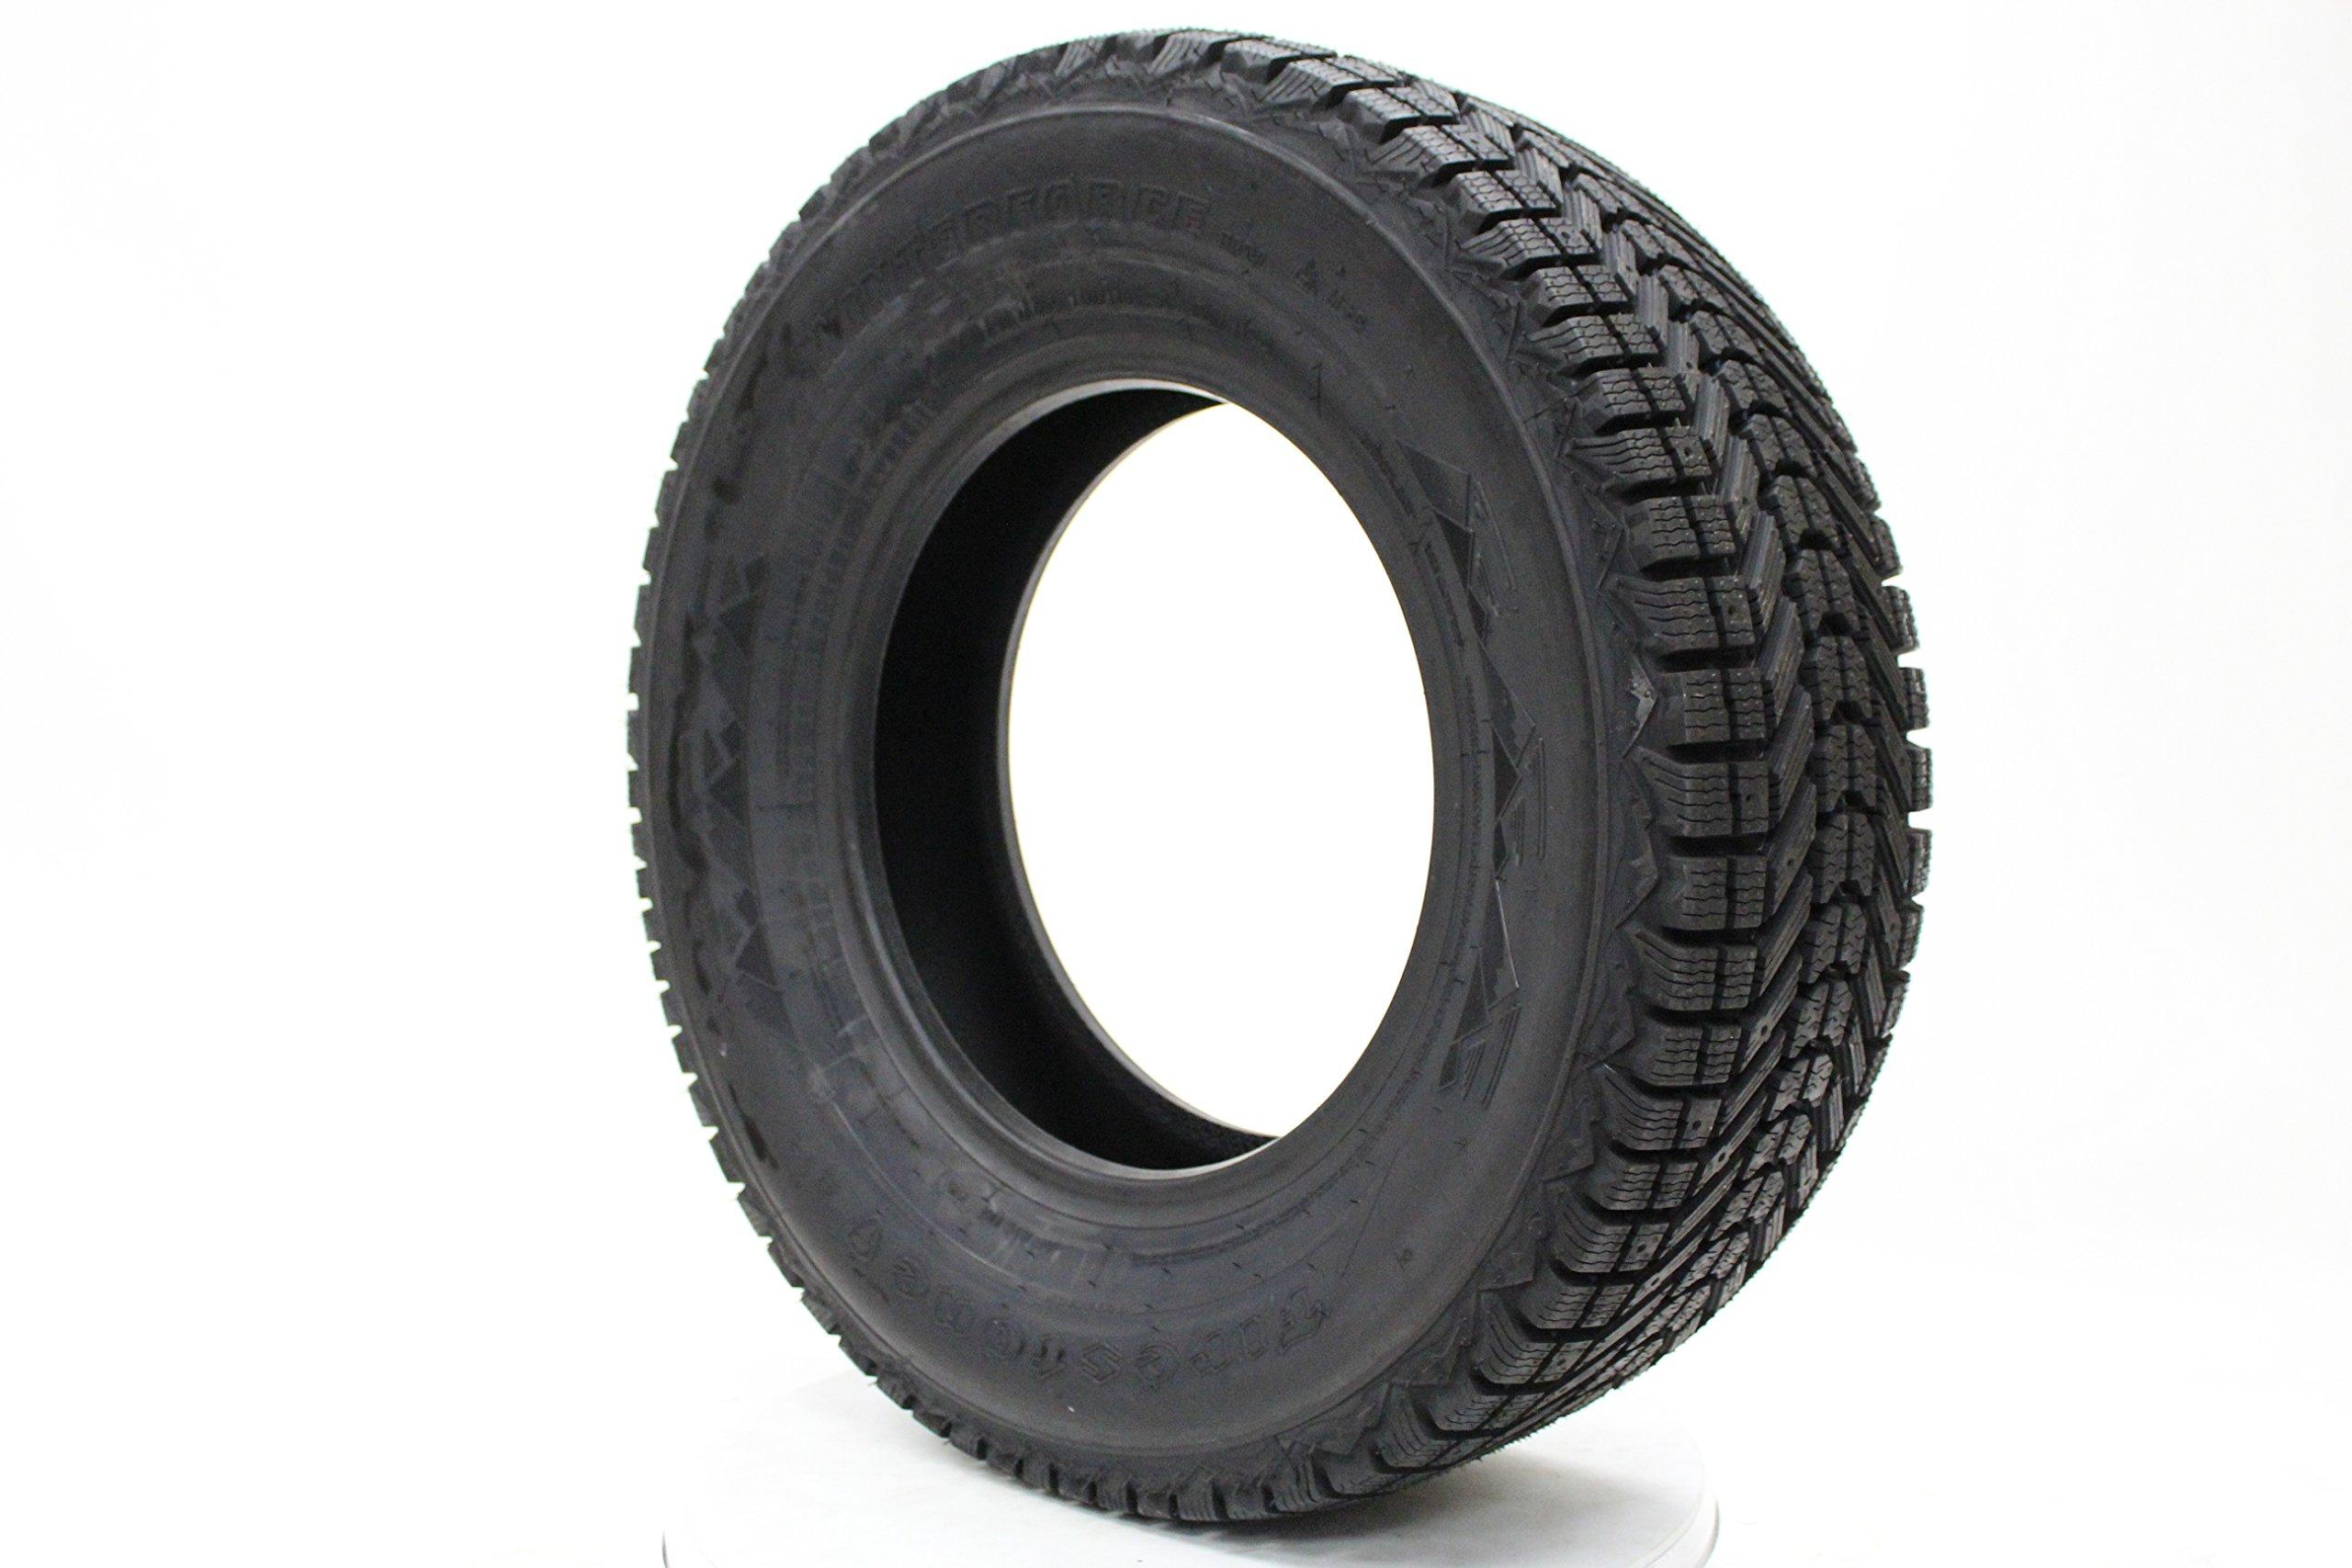 Firestone Winterforce UV Winter Radial Tire - 215/65R16 98S